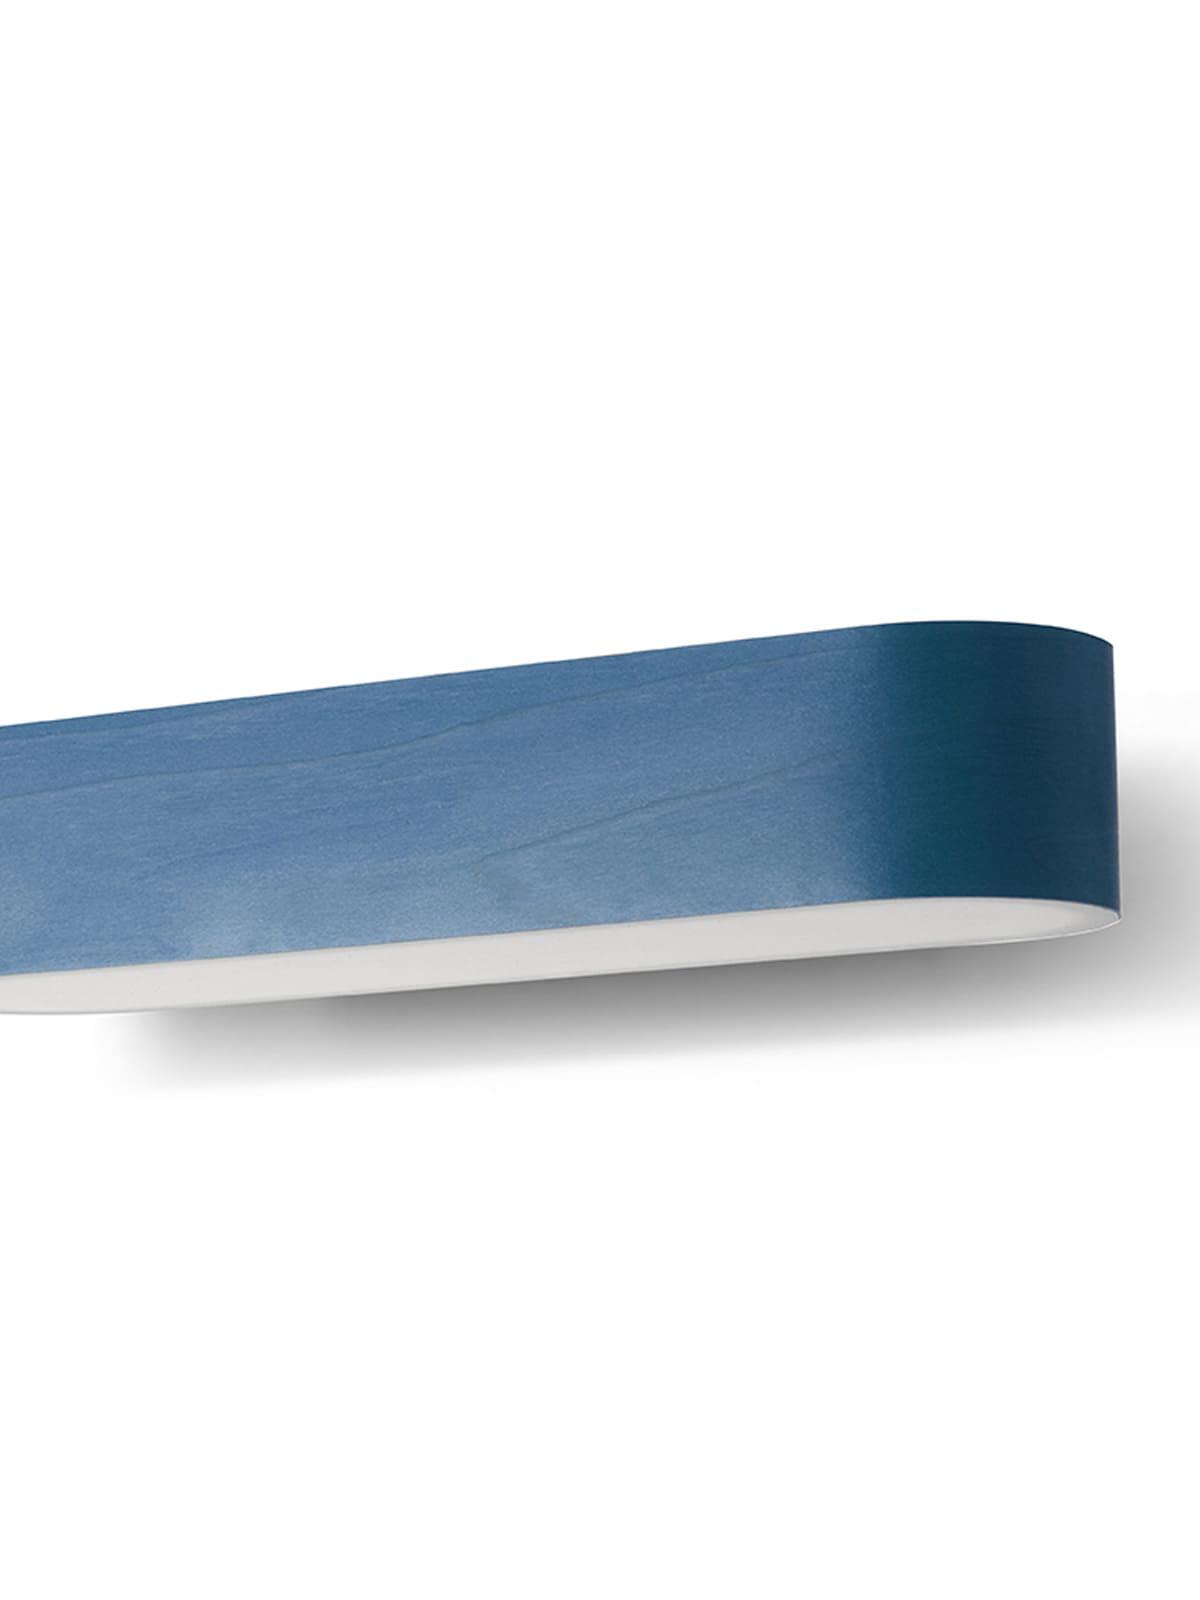 LZF Lamps Furnierholz Farbe Blau Azul